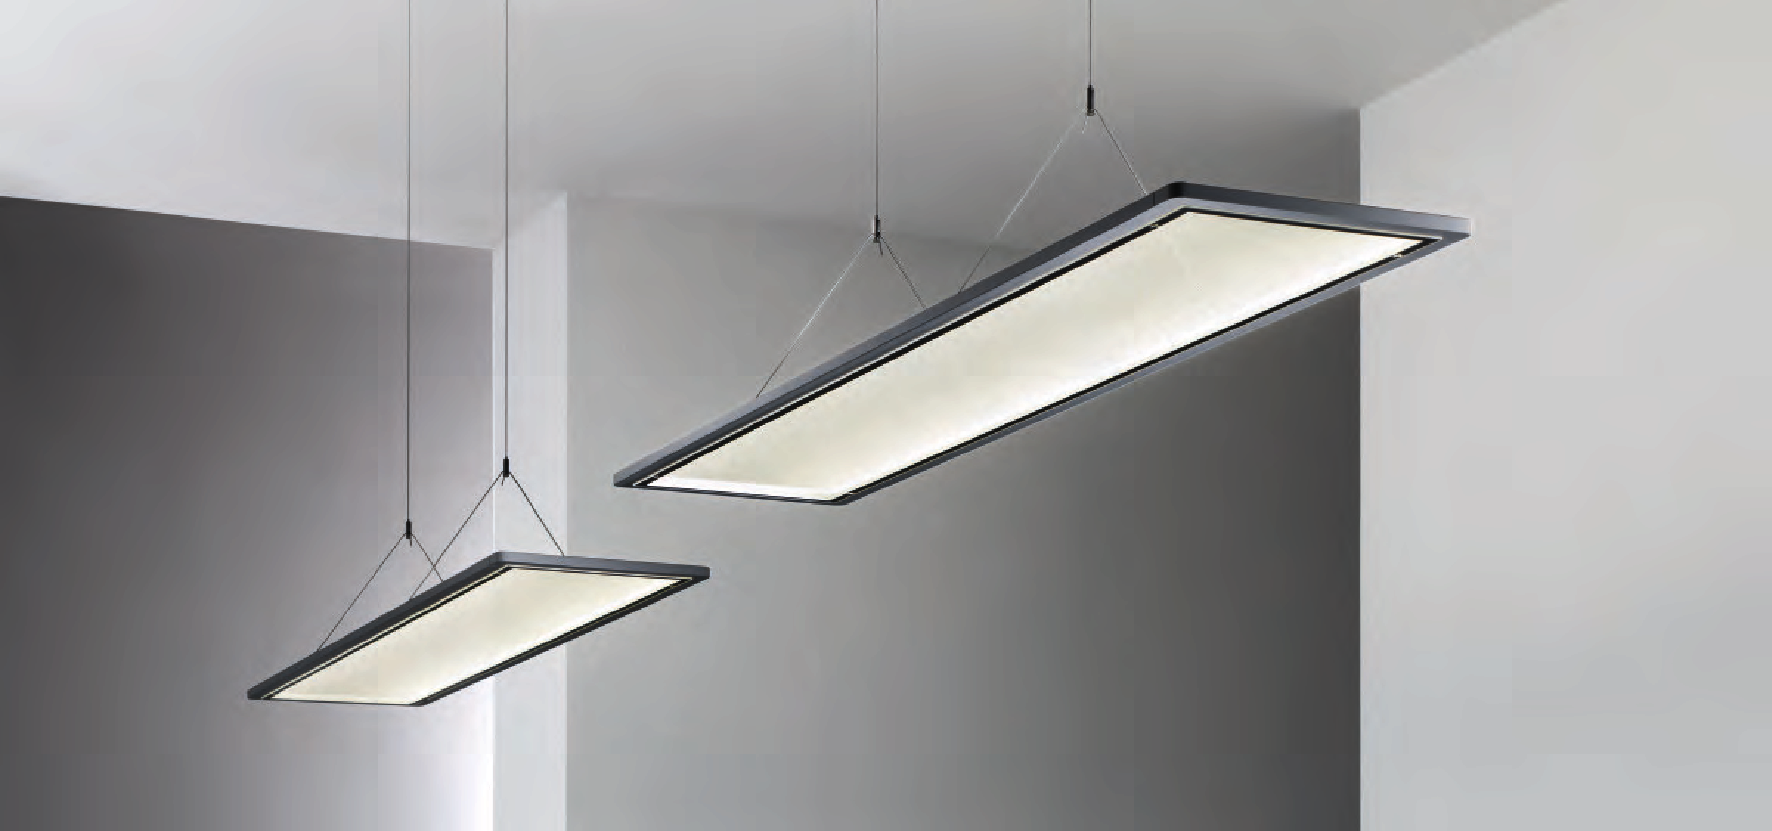 Leuchtentechnik Normung Sicherheitsvorschriften